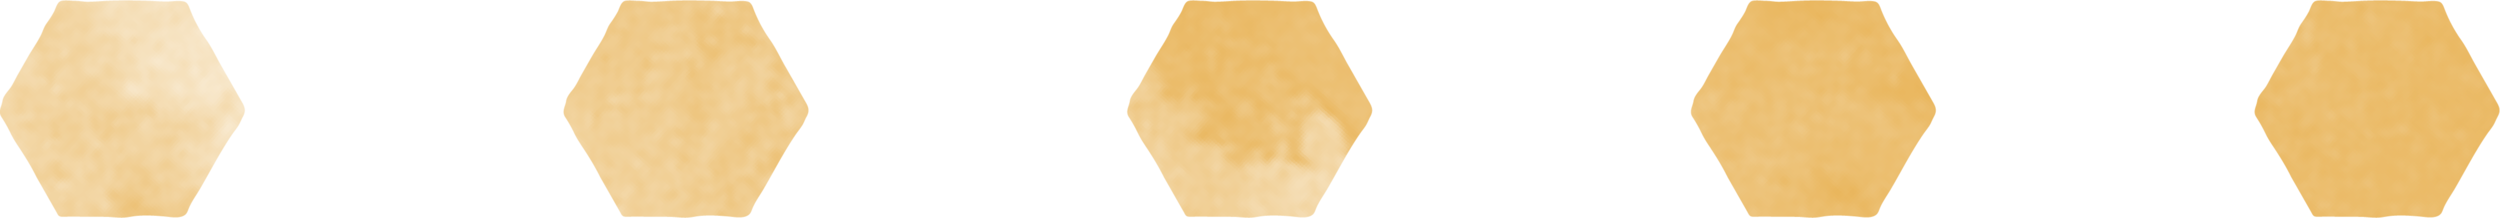 hexagon_dot_watercolor_pattern_yellow.png